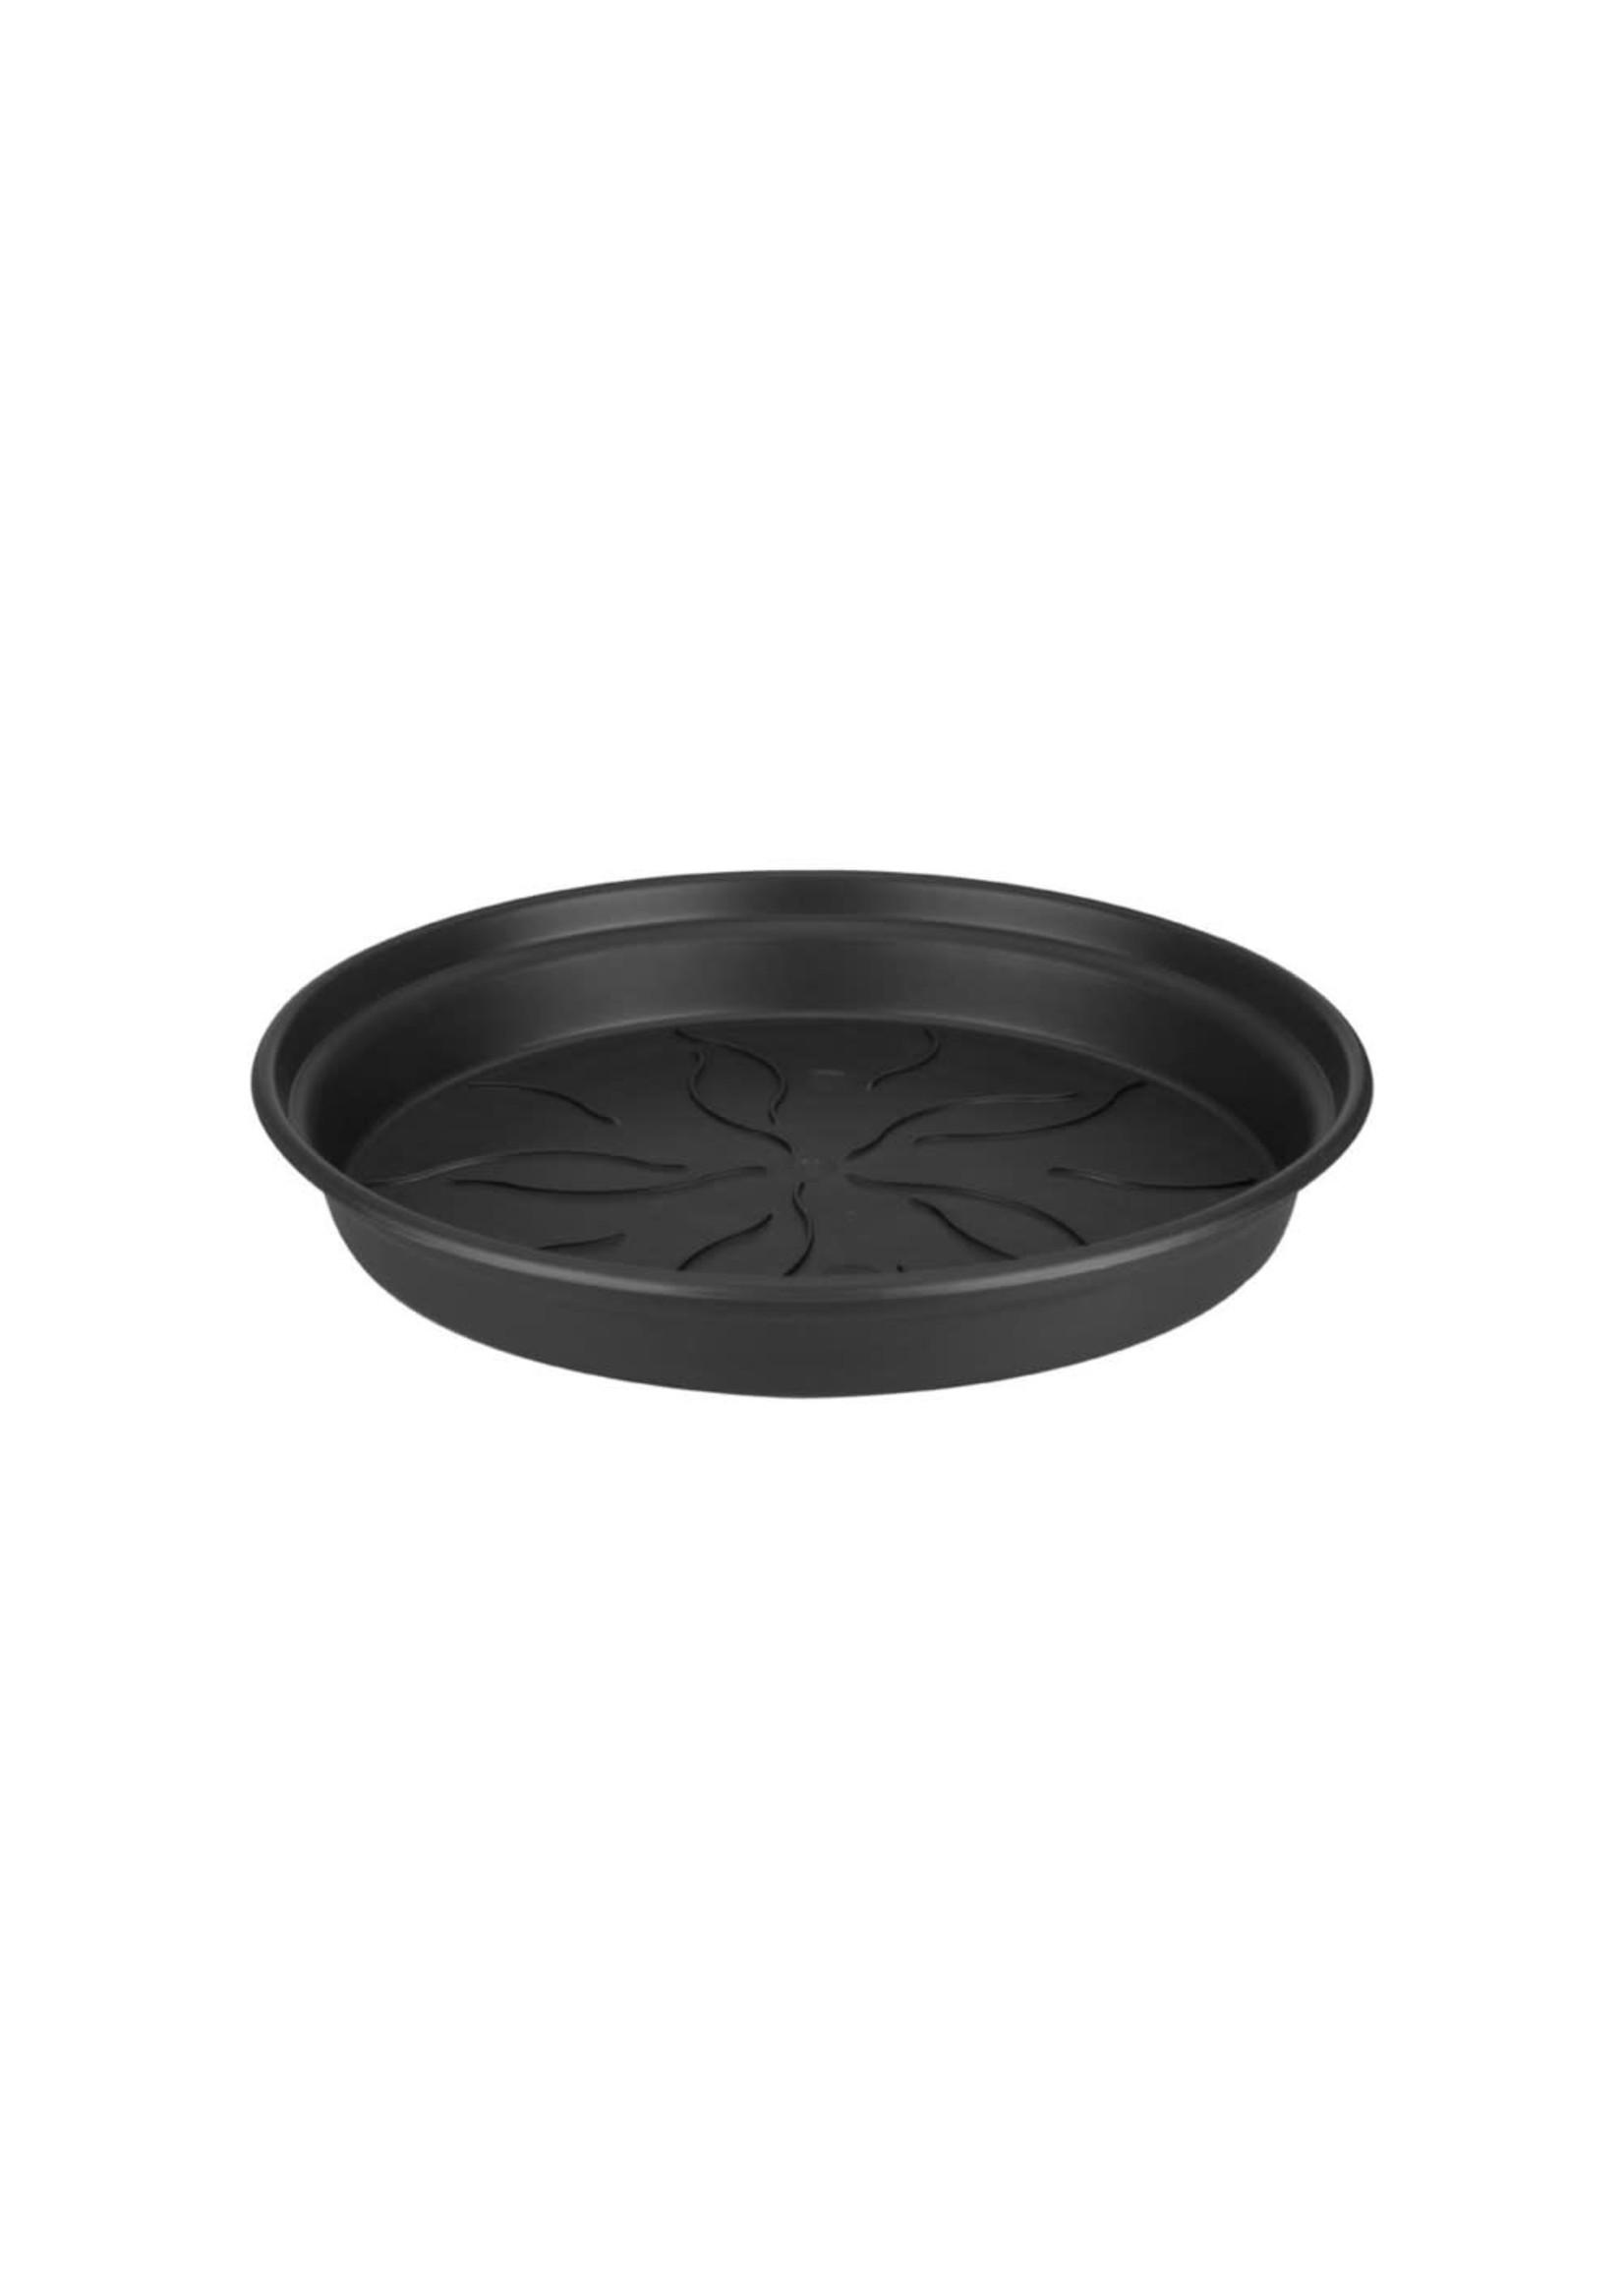 Elho Green Basics saucer 41cm Black